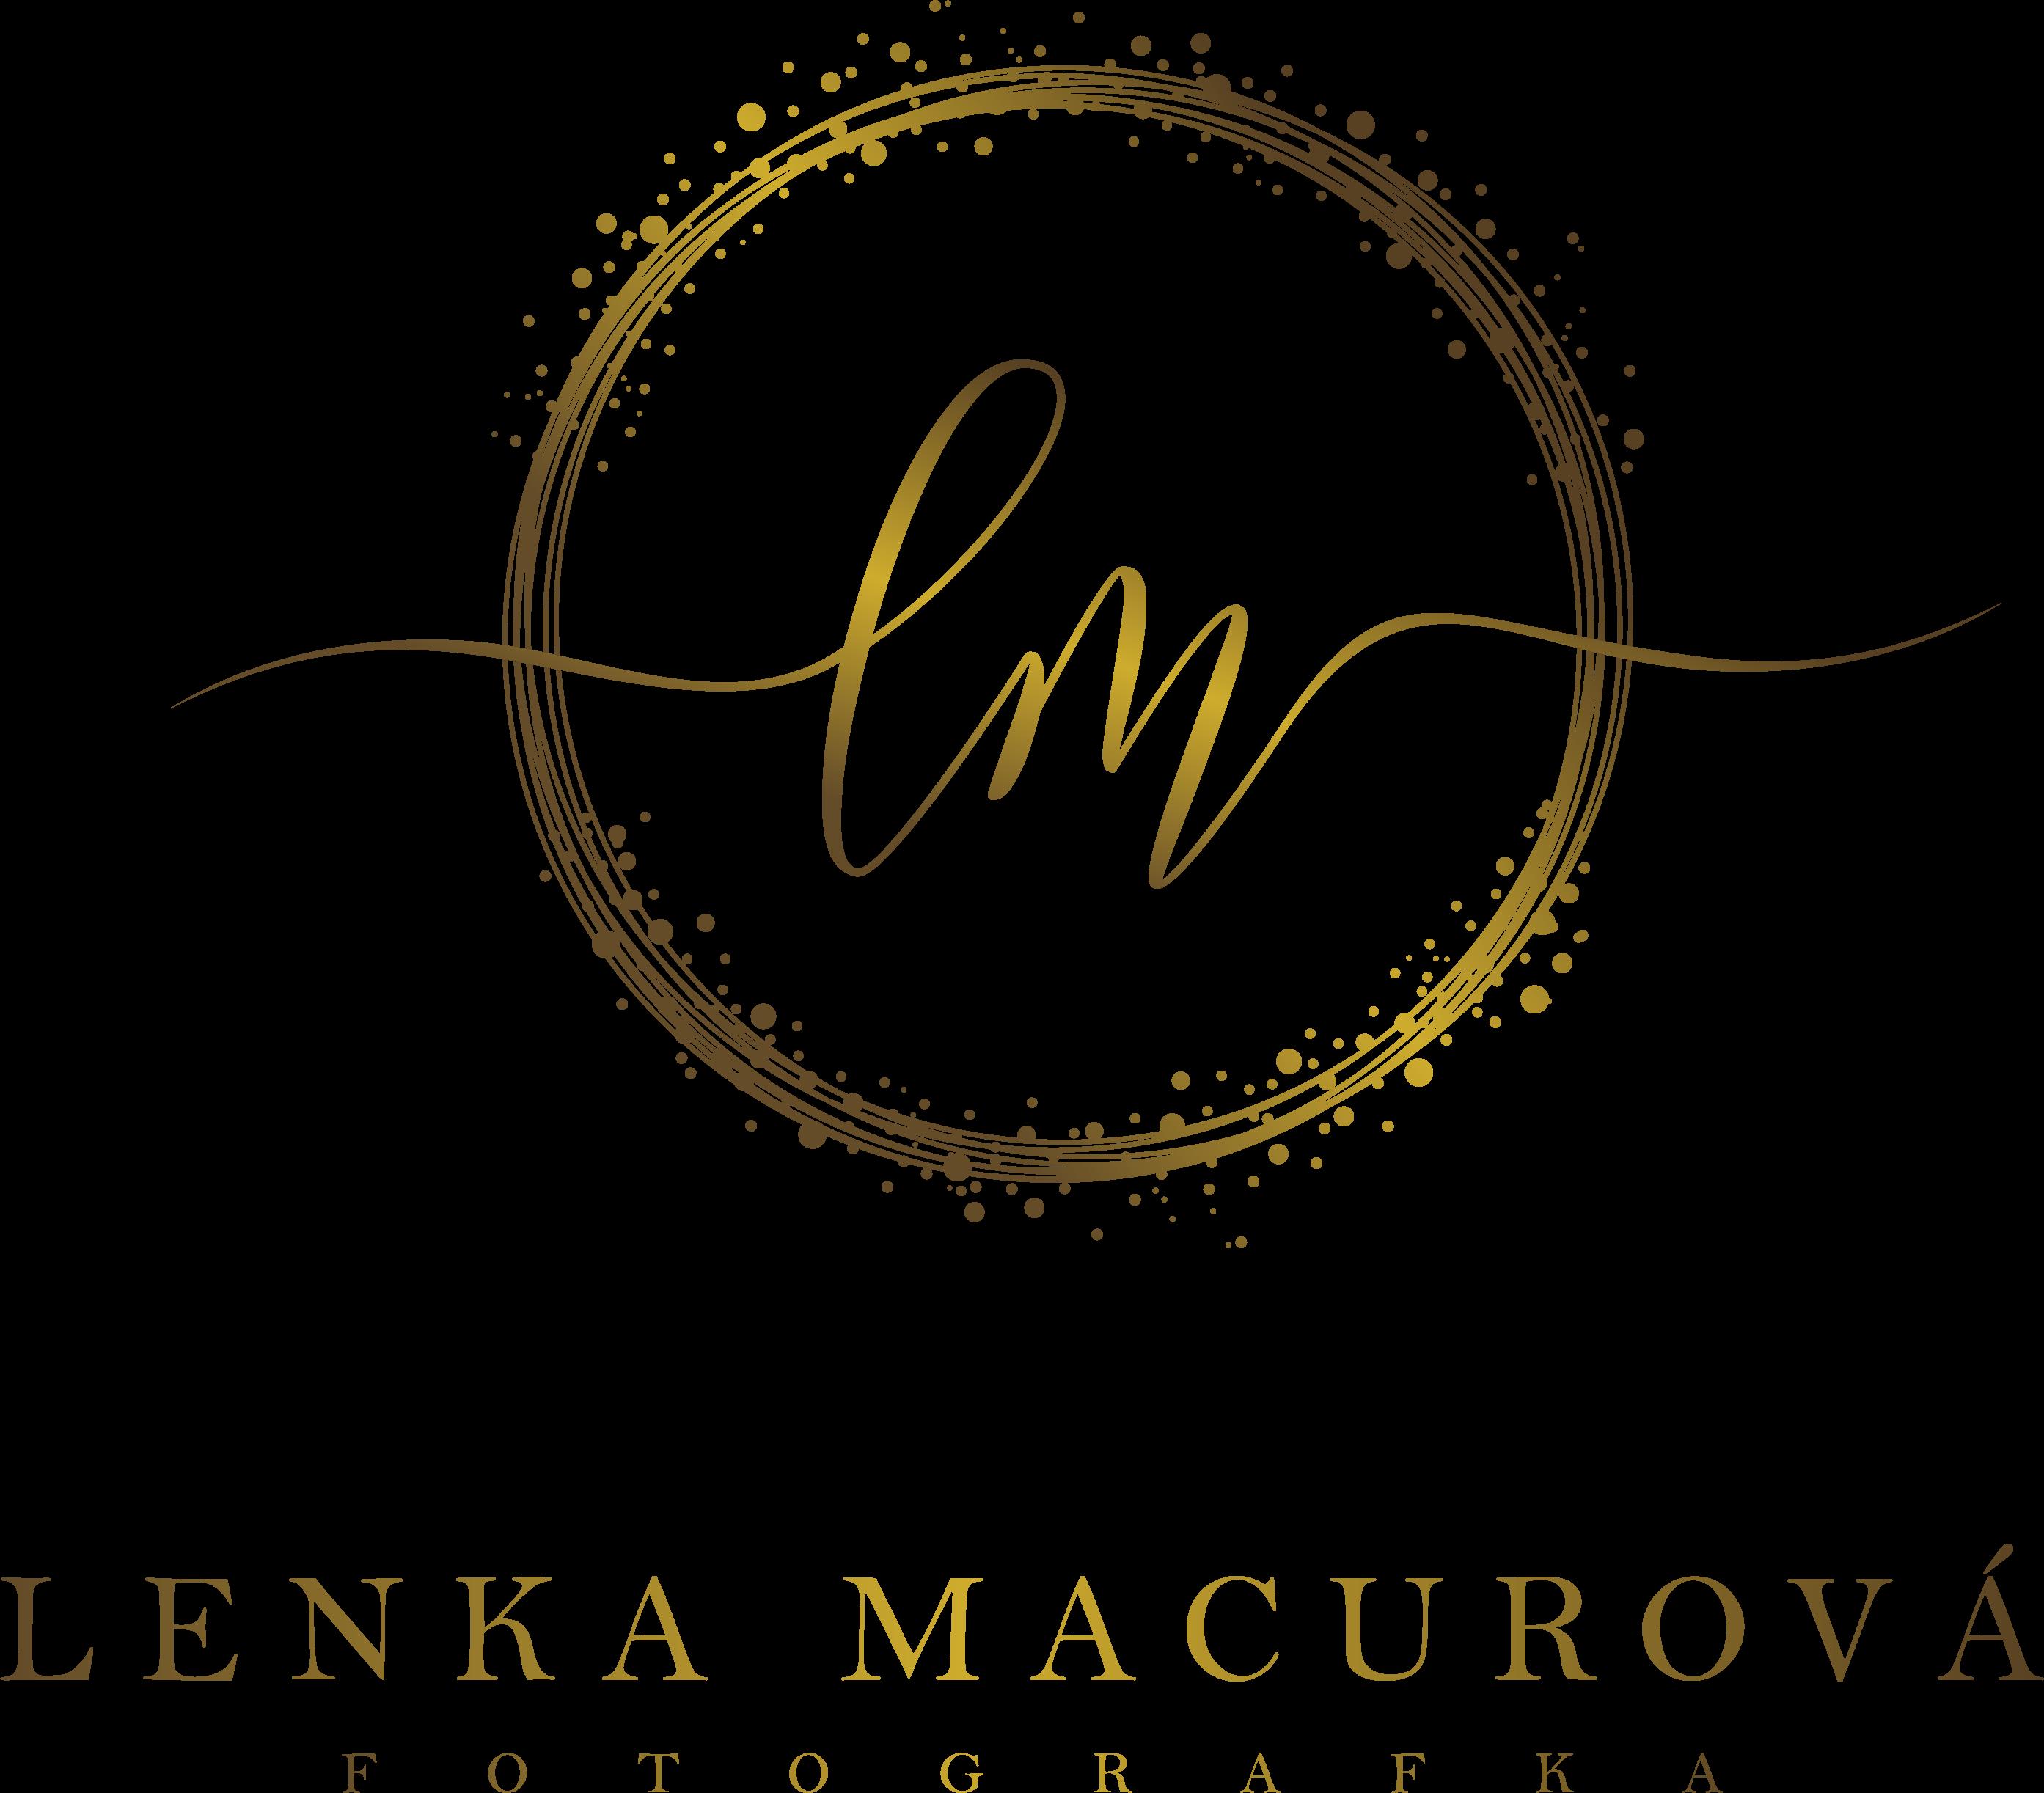 Lenka Macurová